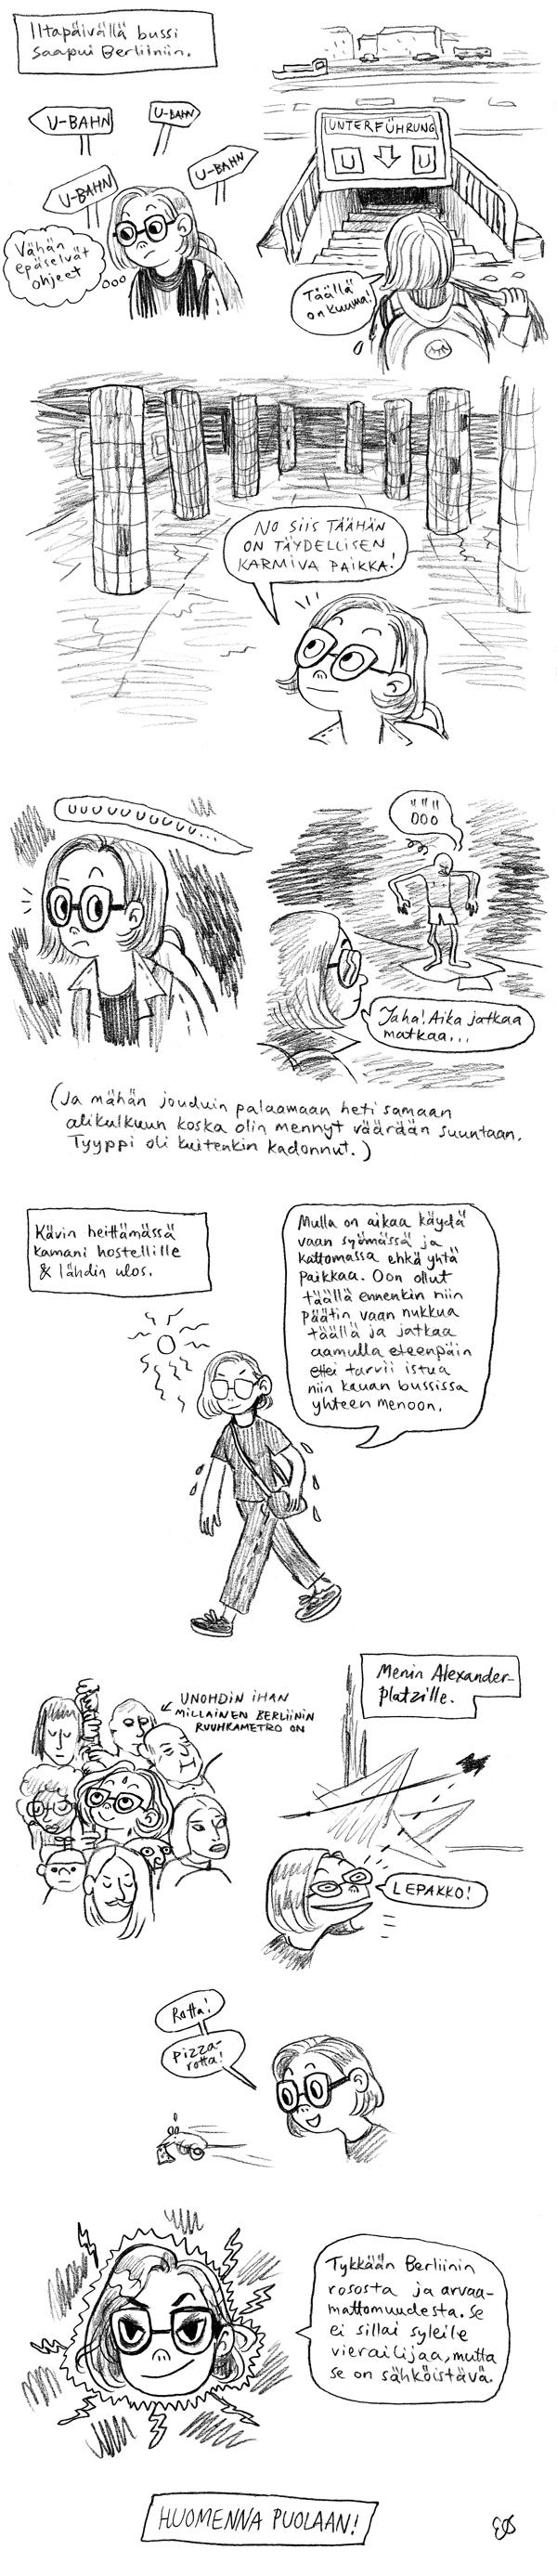 helsinki-berliini3